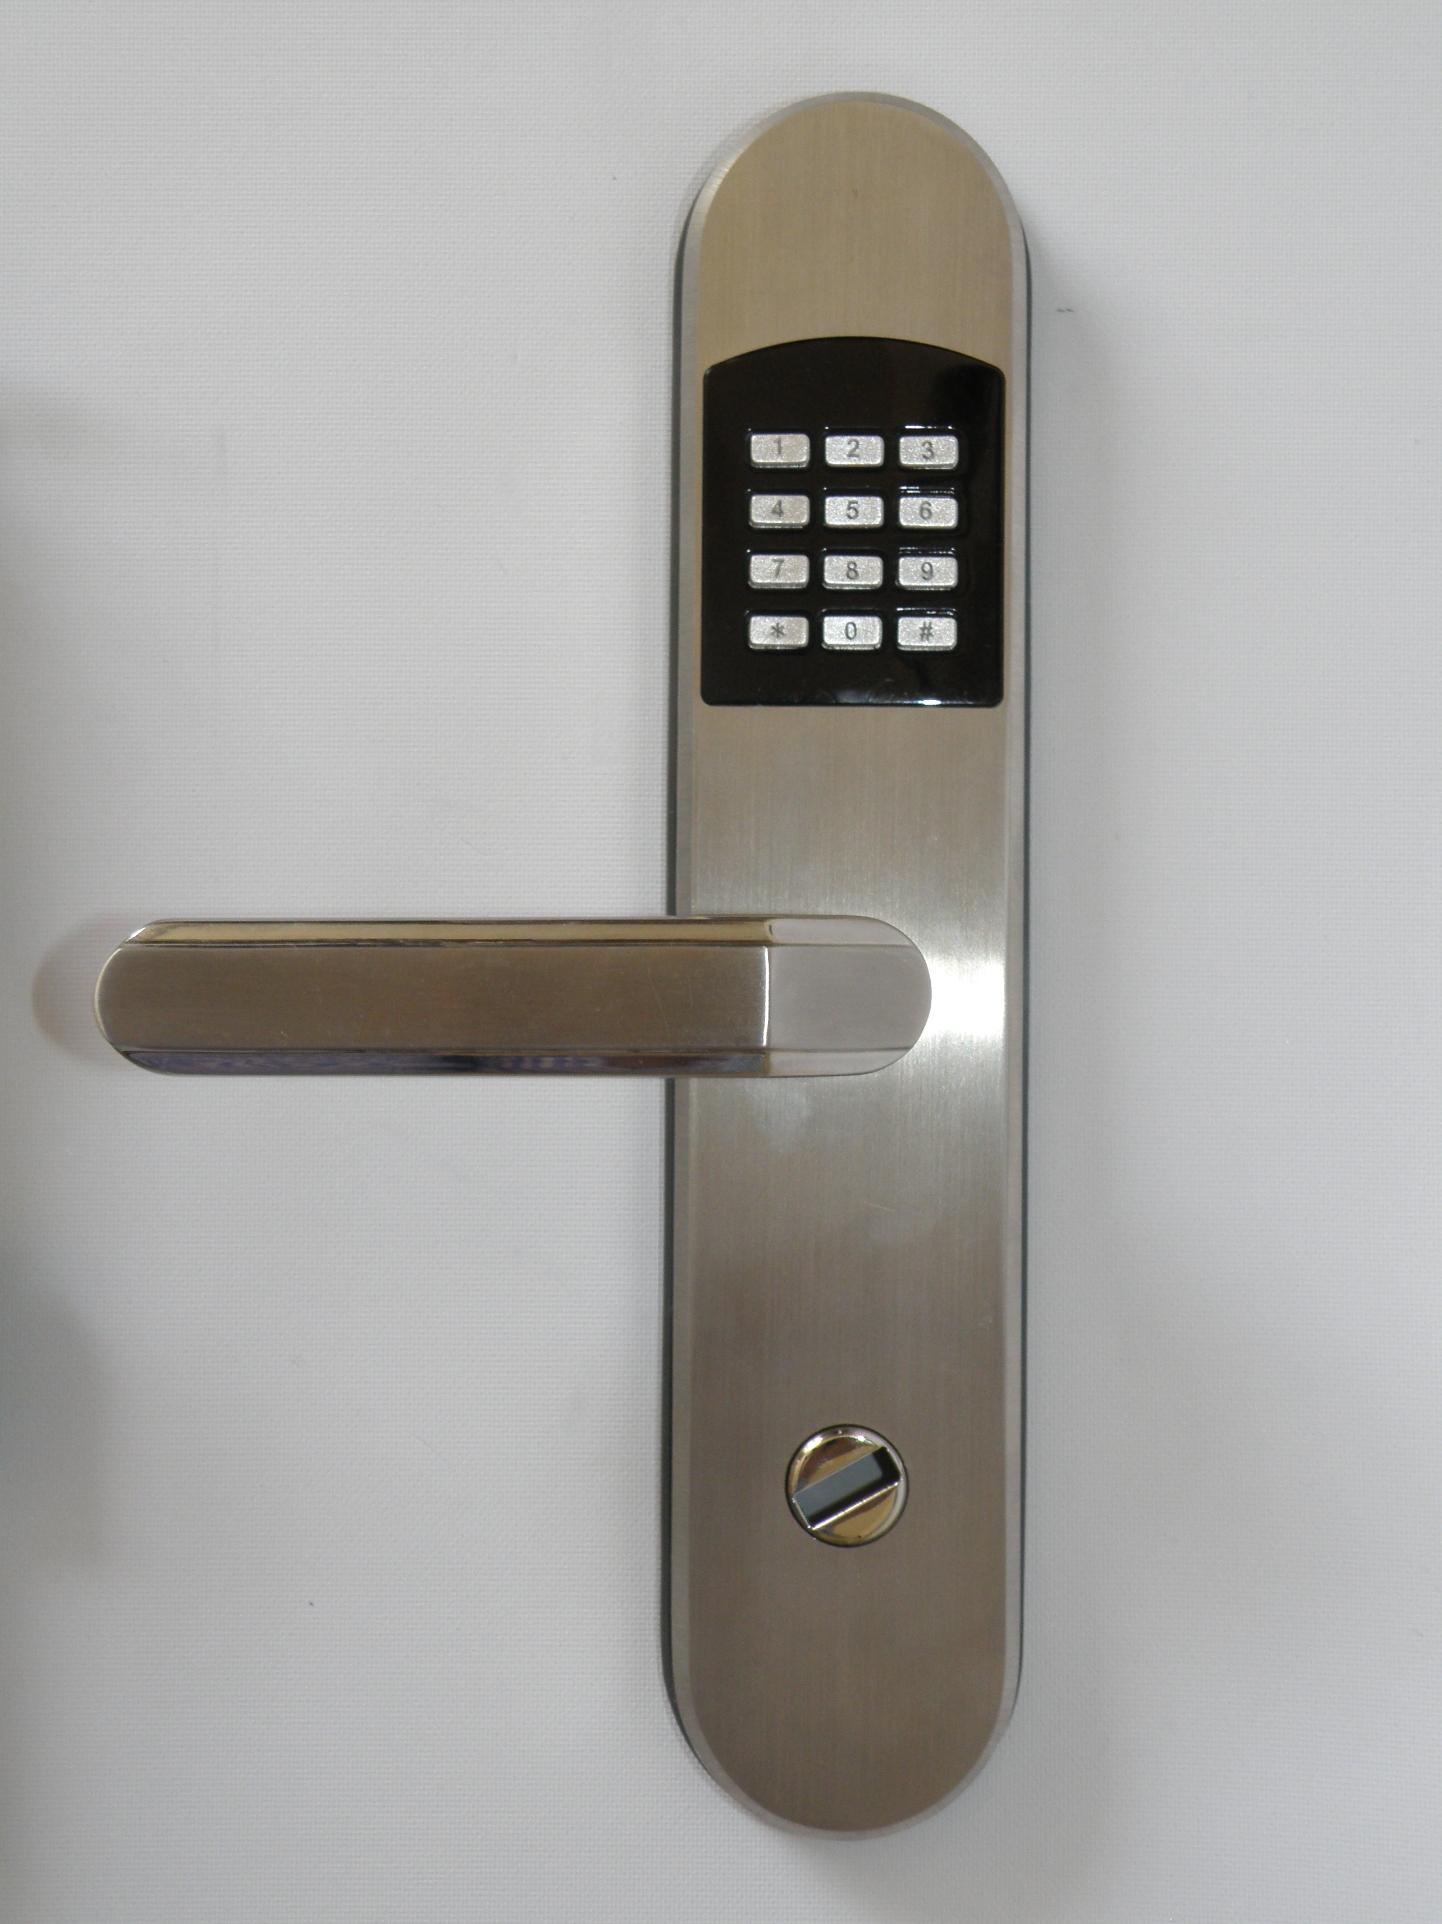 Remote Control Window Curtains Electronic Keyless Door Locks Gold Digital Keypad Lock Rfid And Code Access Mrdv 10 Lh Left Hand